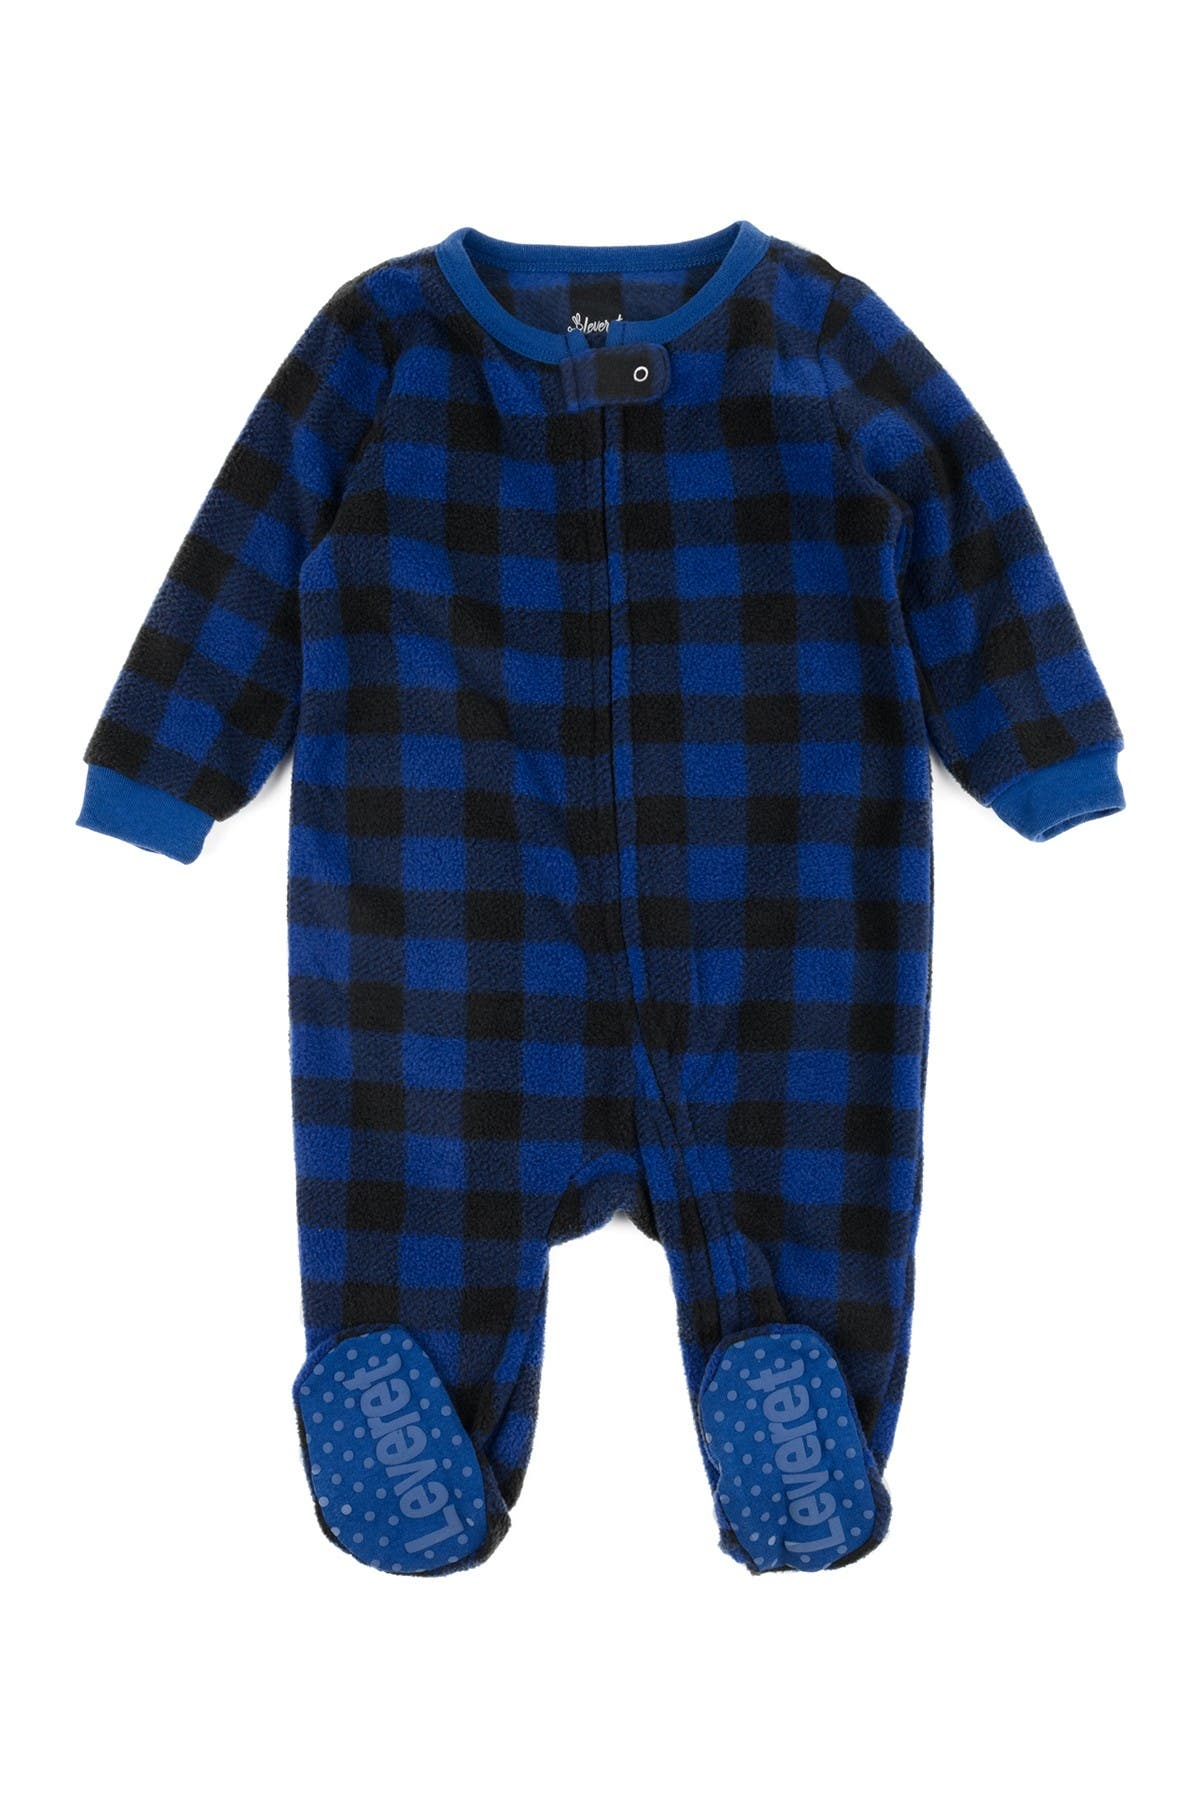 Image of Leveret Navy Blue Plaid Footed Fleece Sleeper